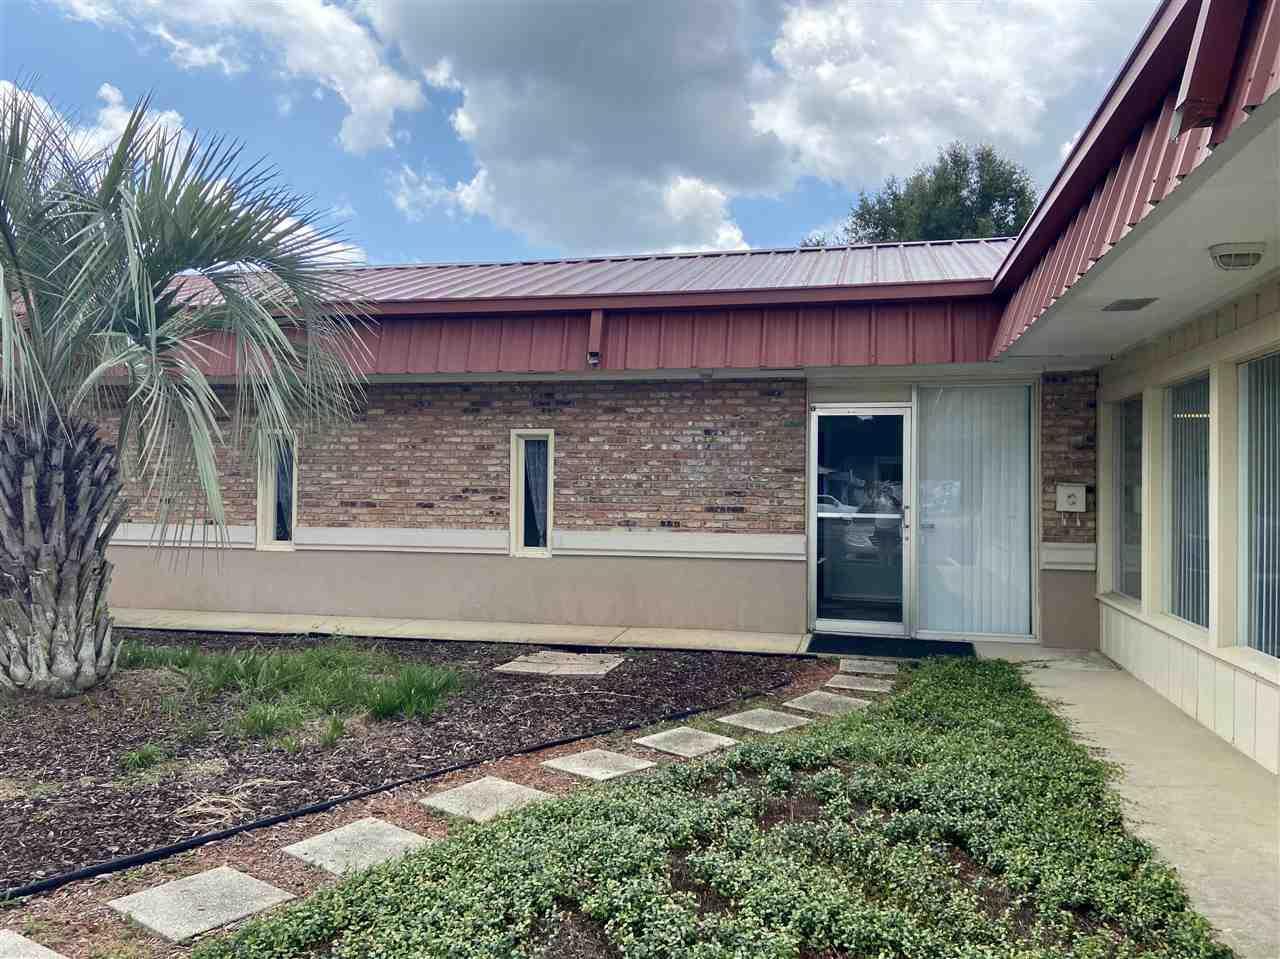 3101 W Michigan Ave, Pensacola, FL, 32503